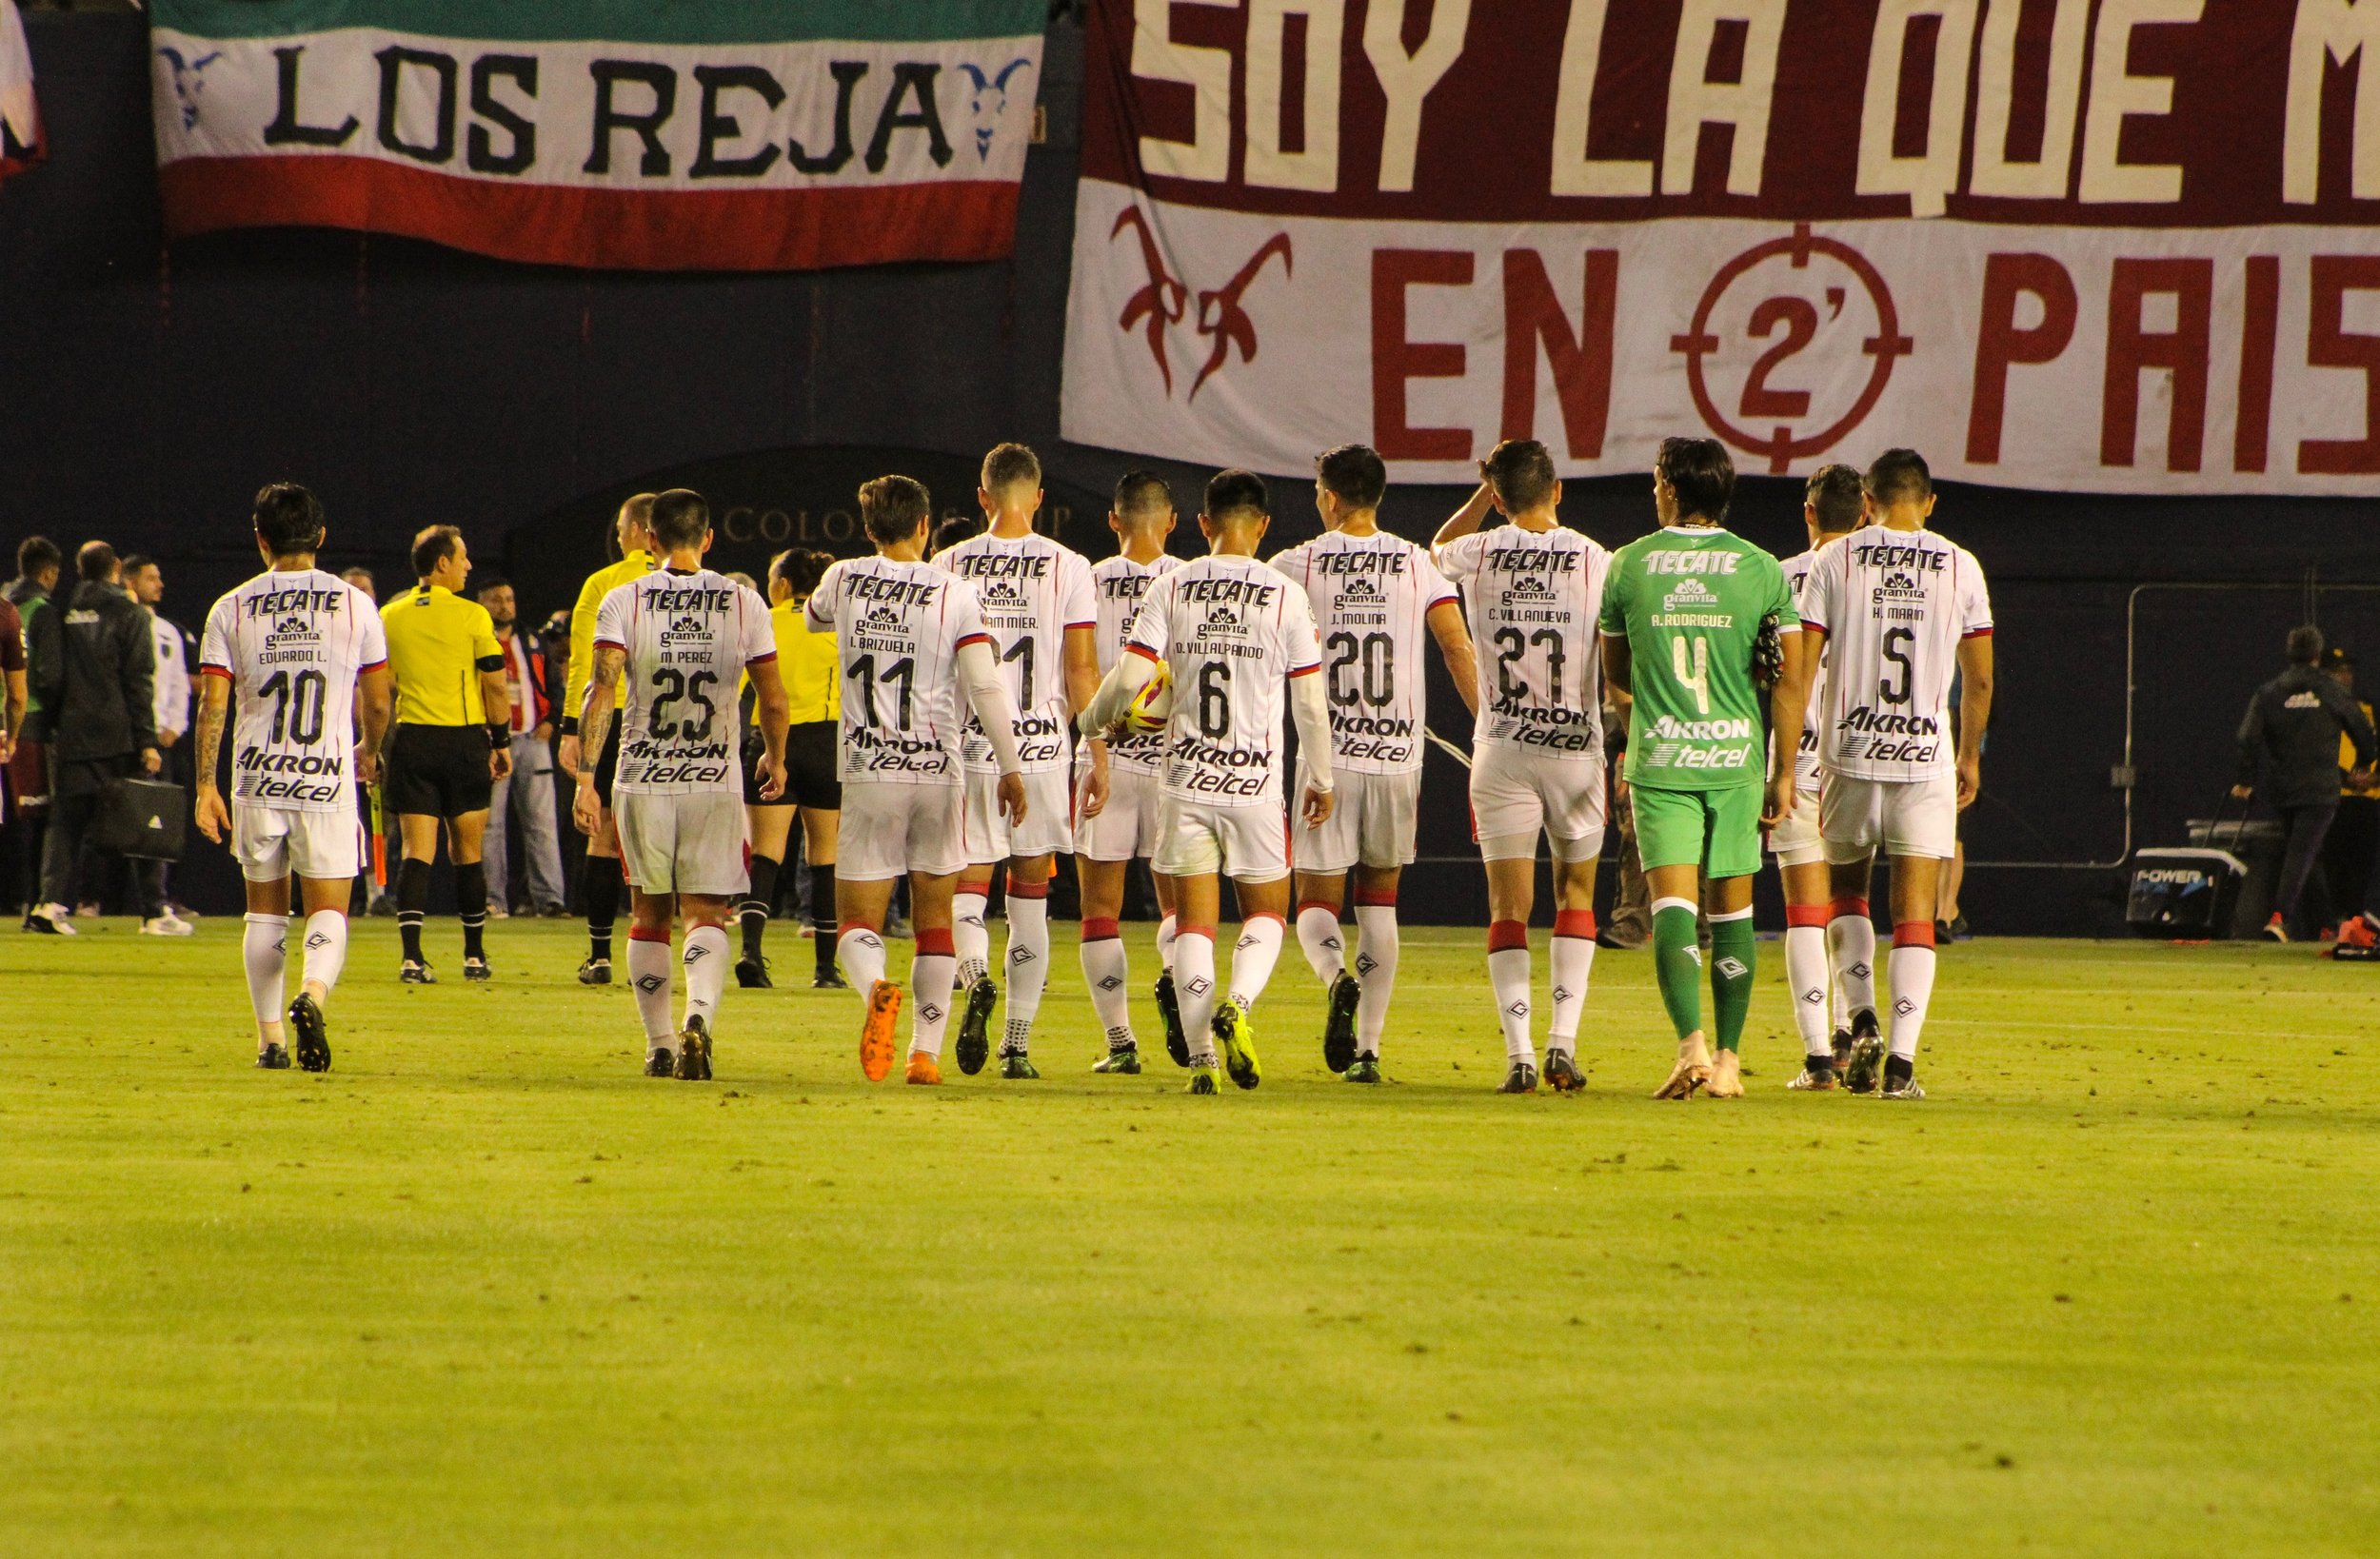 Chivas de Guadalajara by Roger Martinez